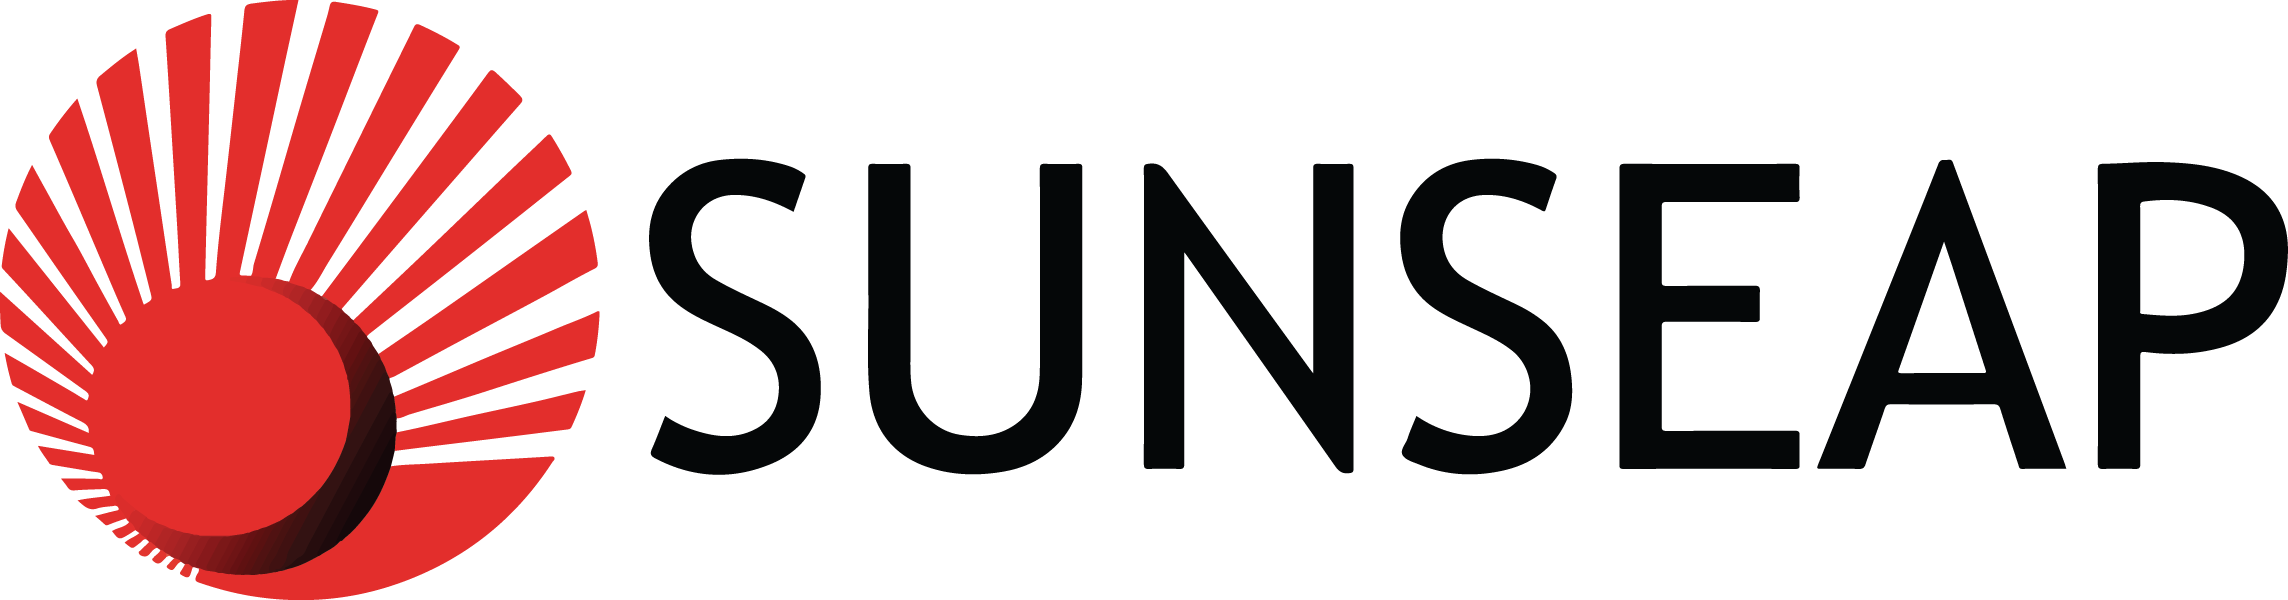 Sunseap Logo (transparent)